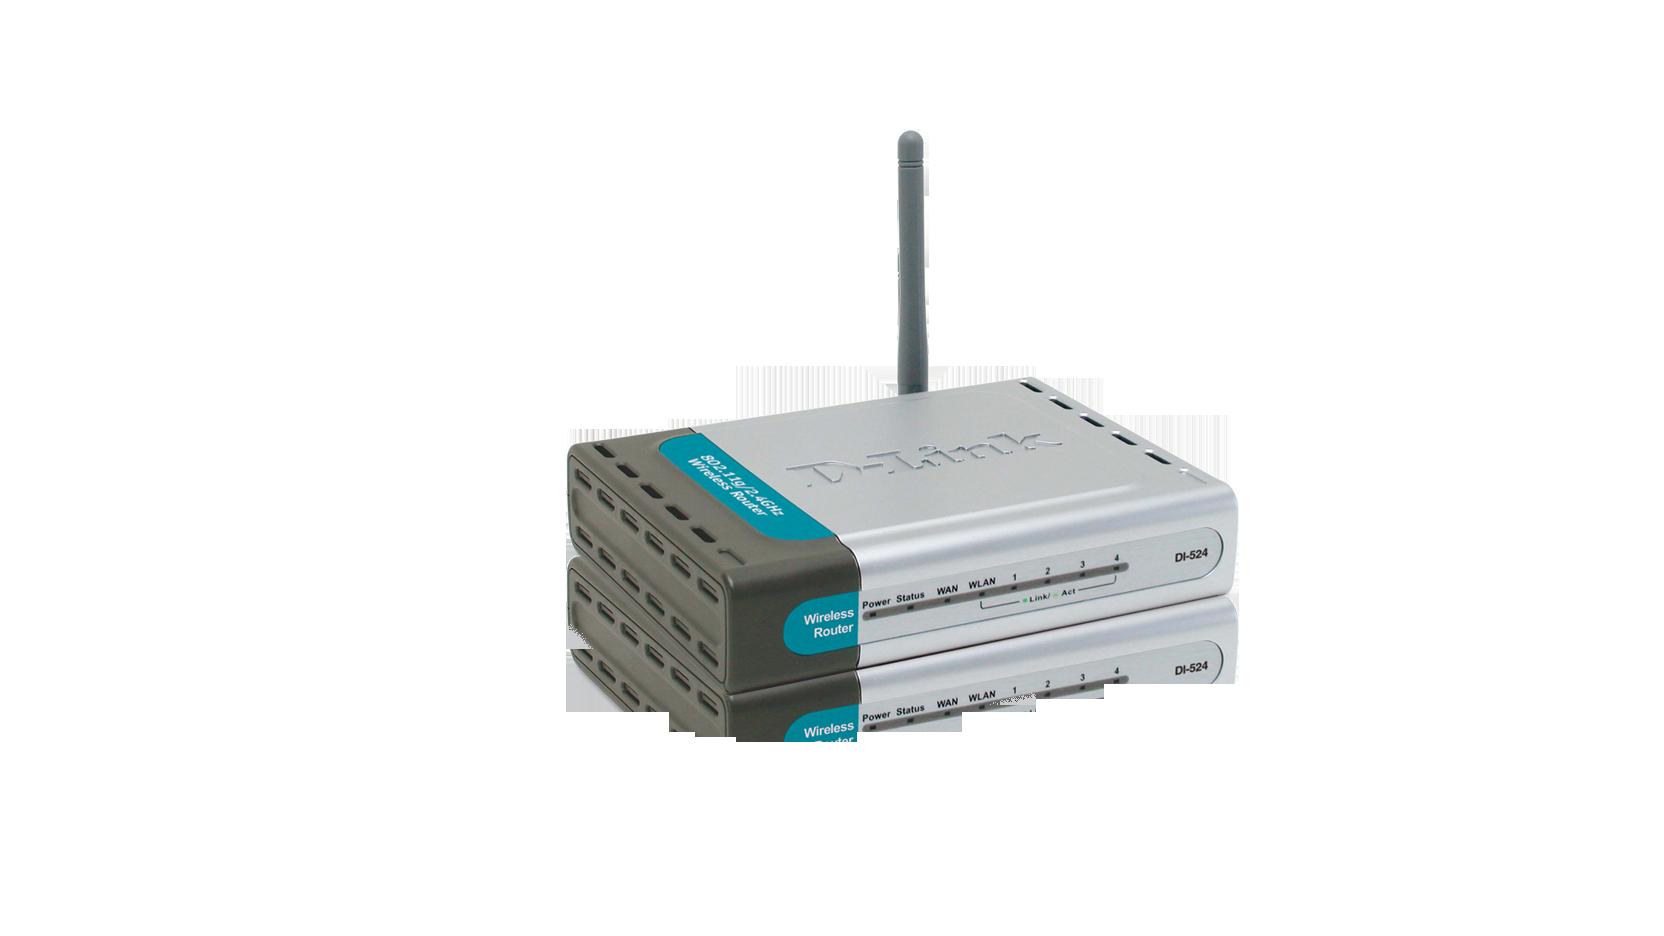 Di524 wireless router user manual di-524_manual. Indd d link.